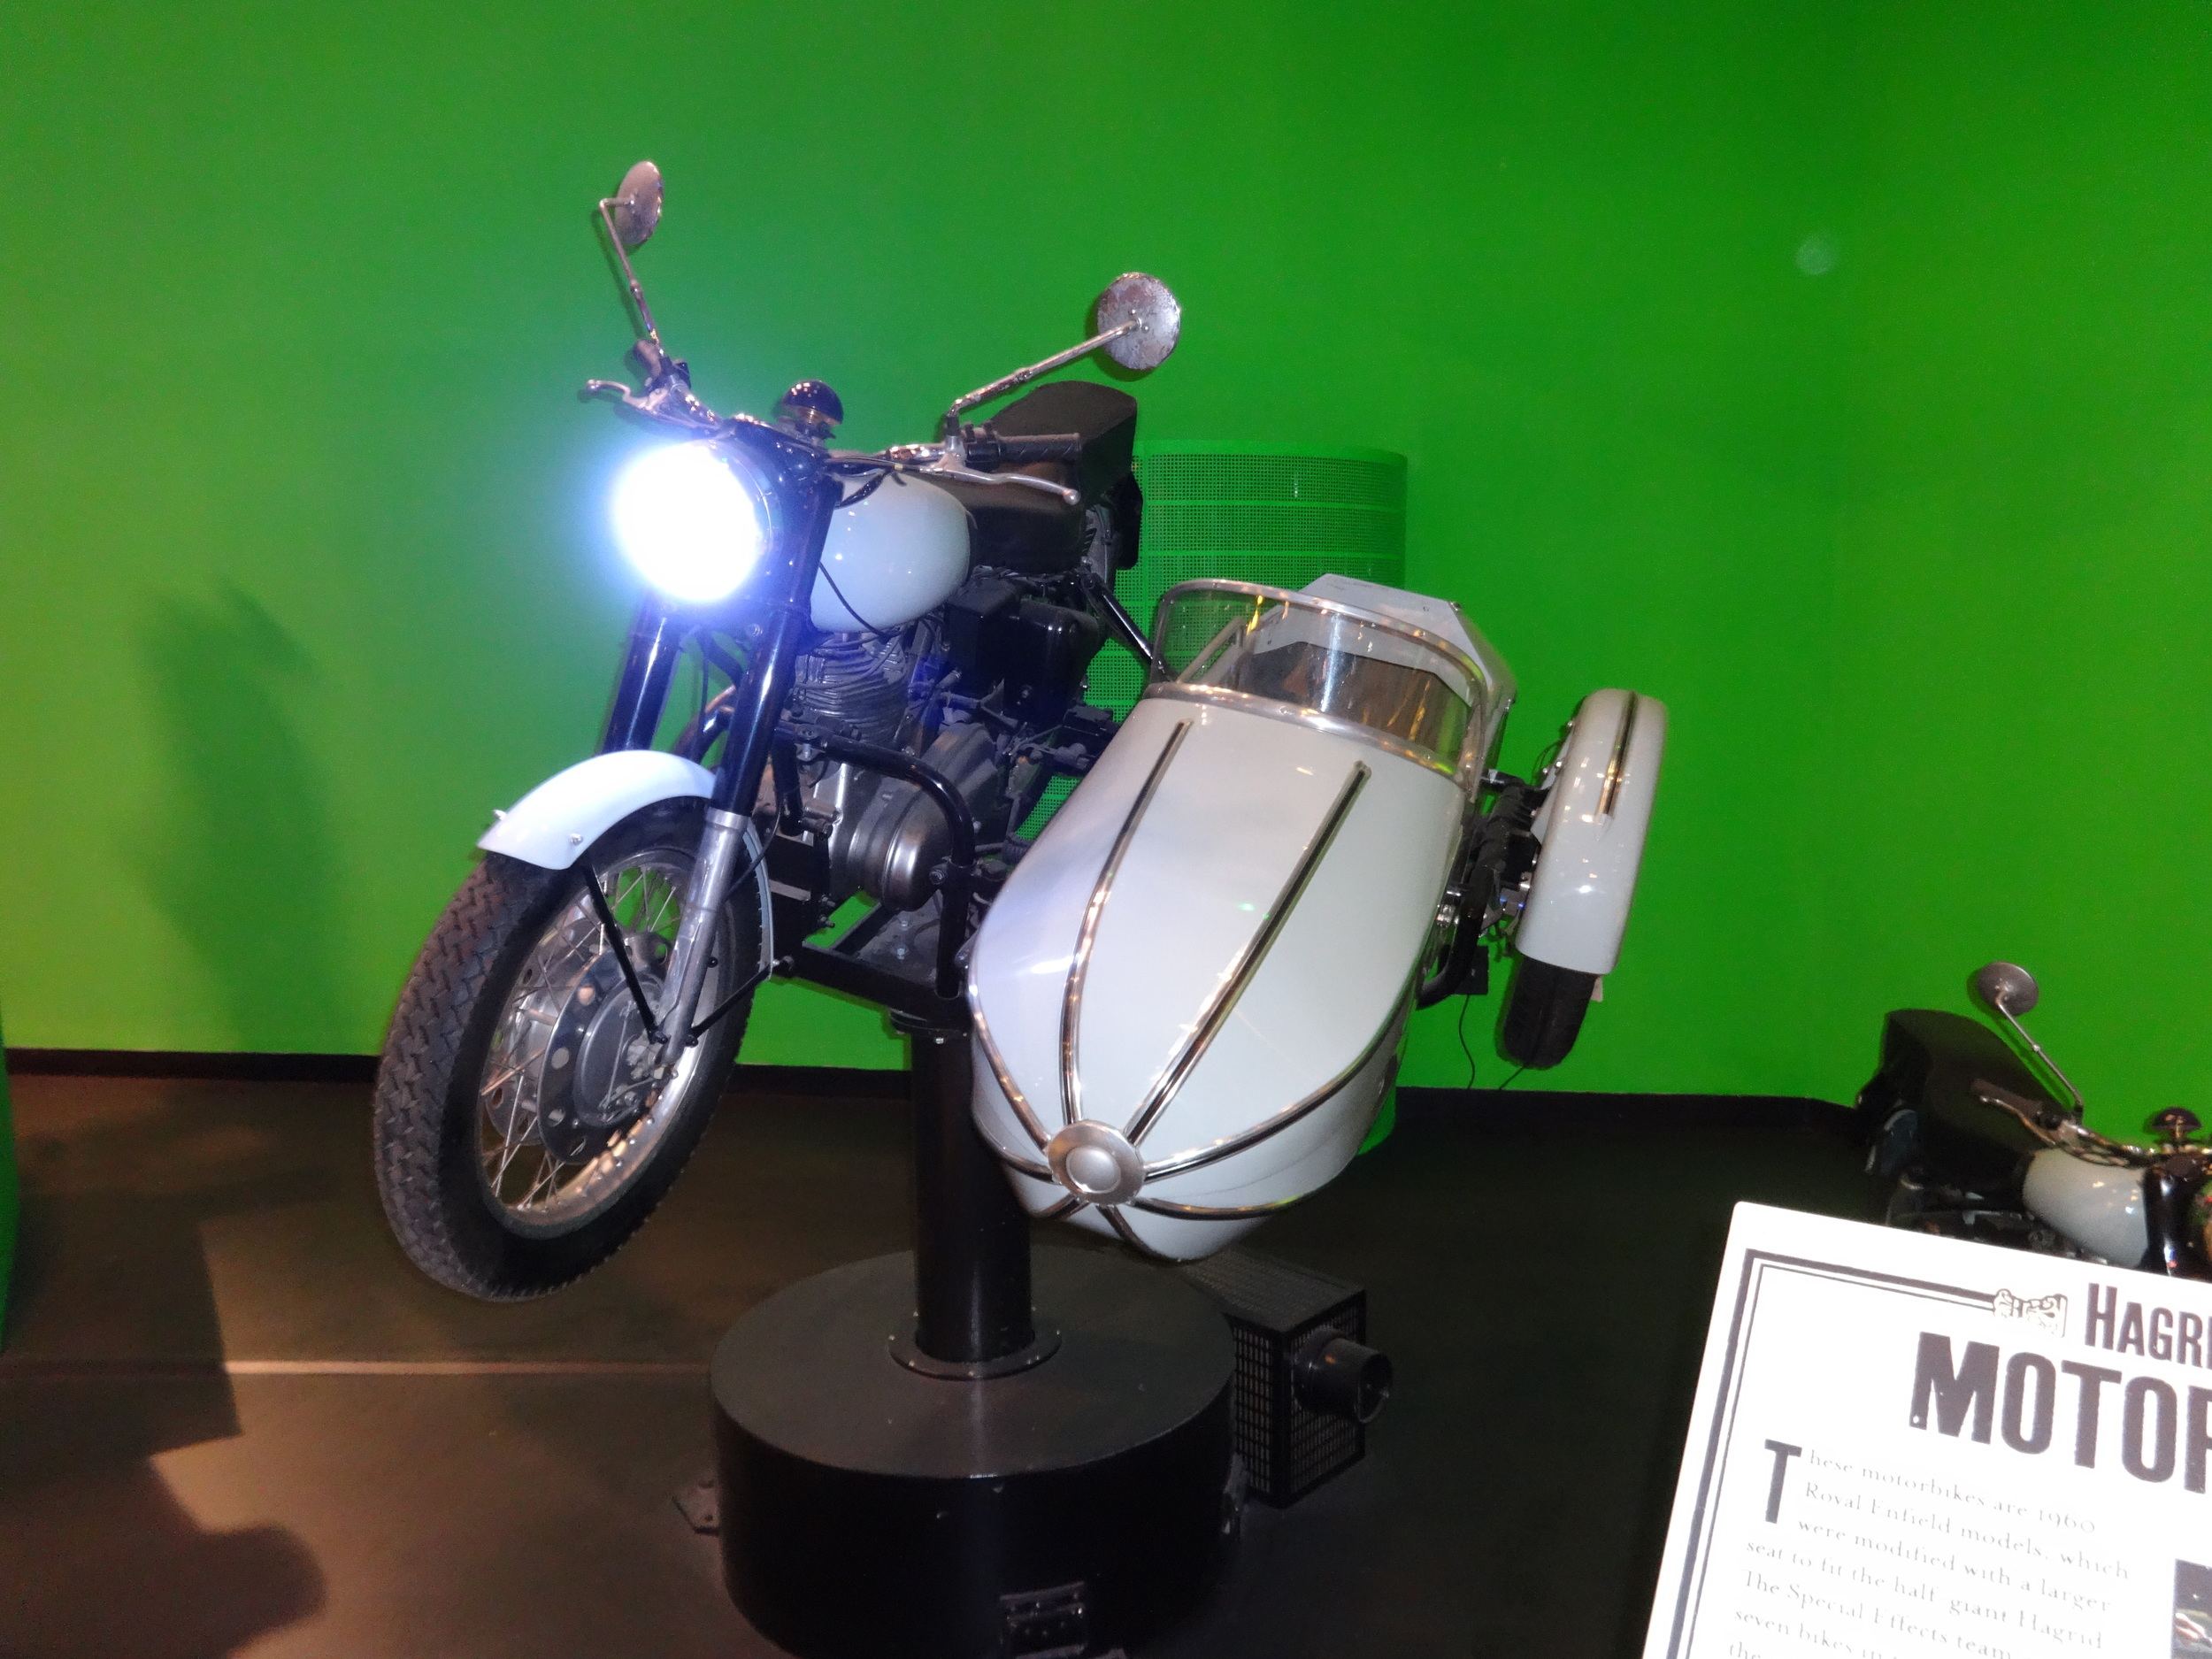 Hagrid's ride